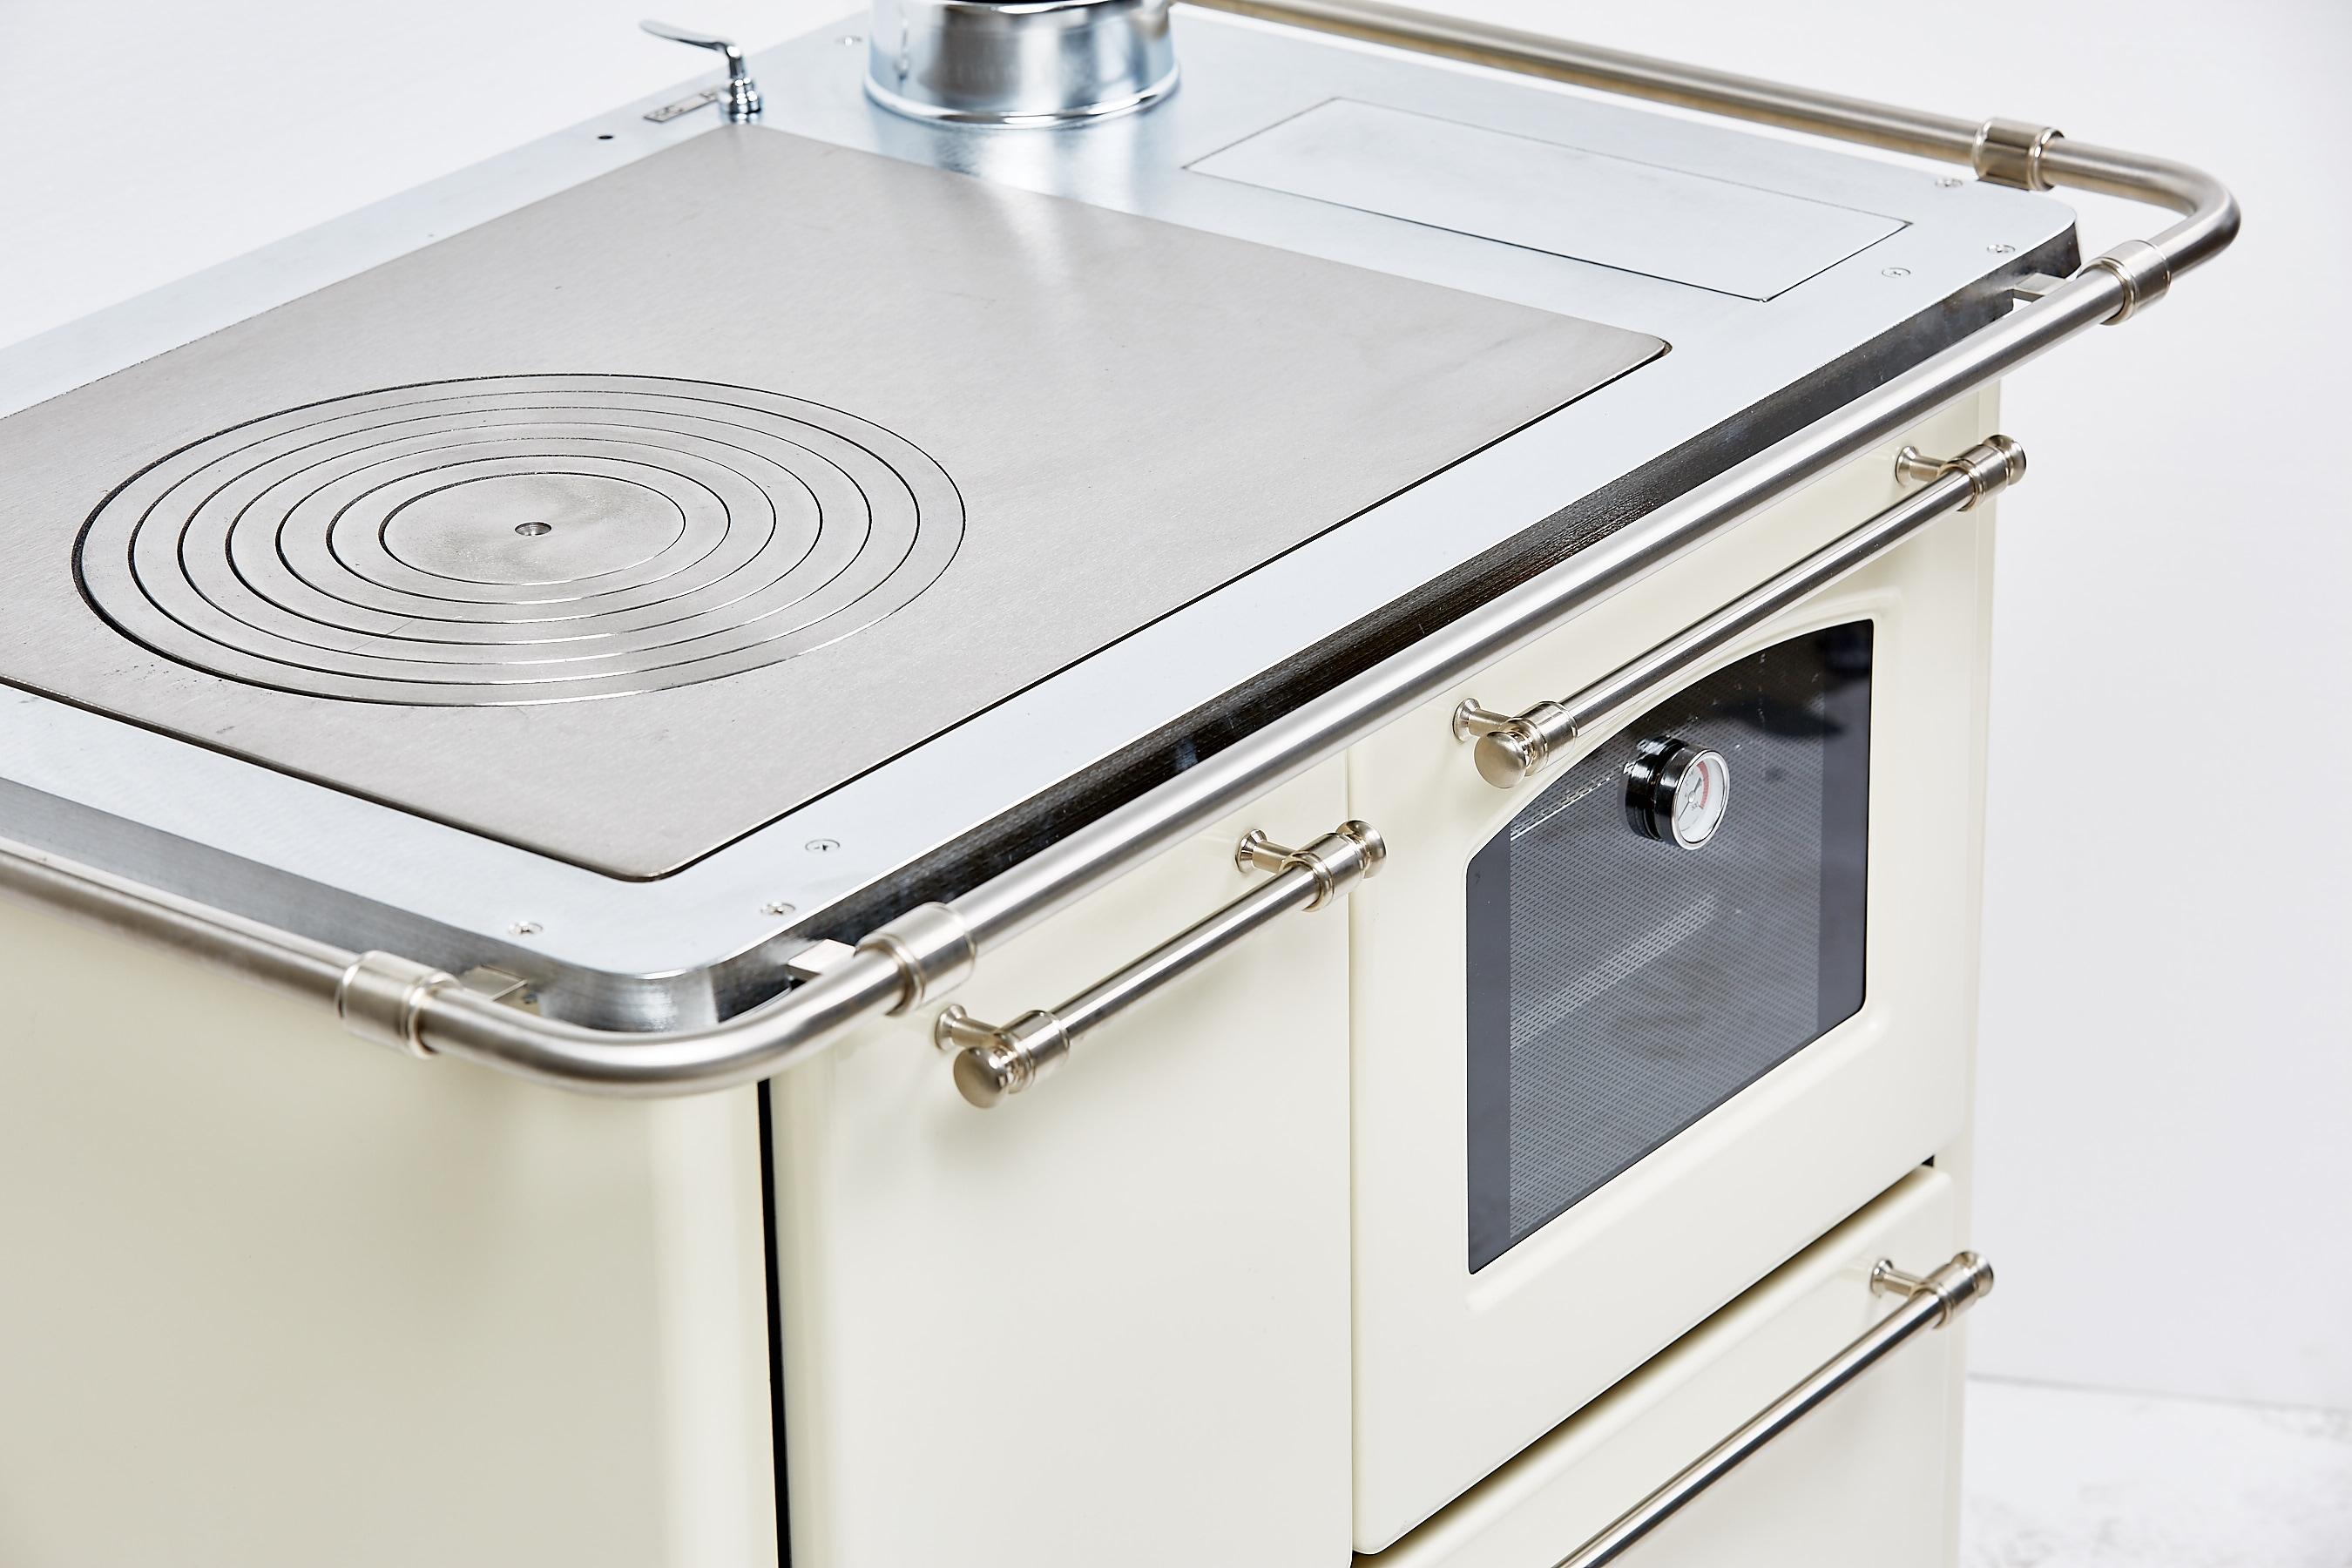 Cucina economica n 5 cucine stufe a legna e termocucine for Cucina economica zoppas